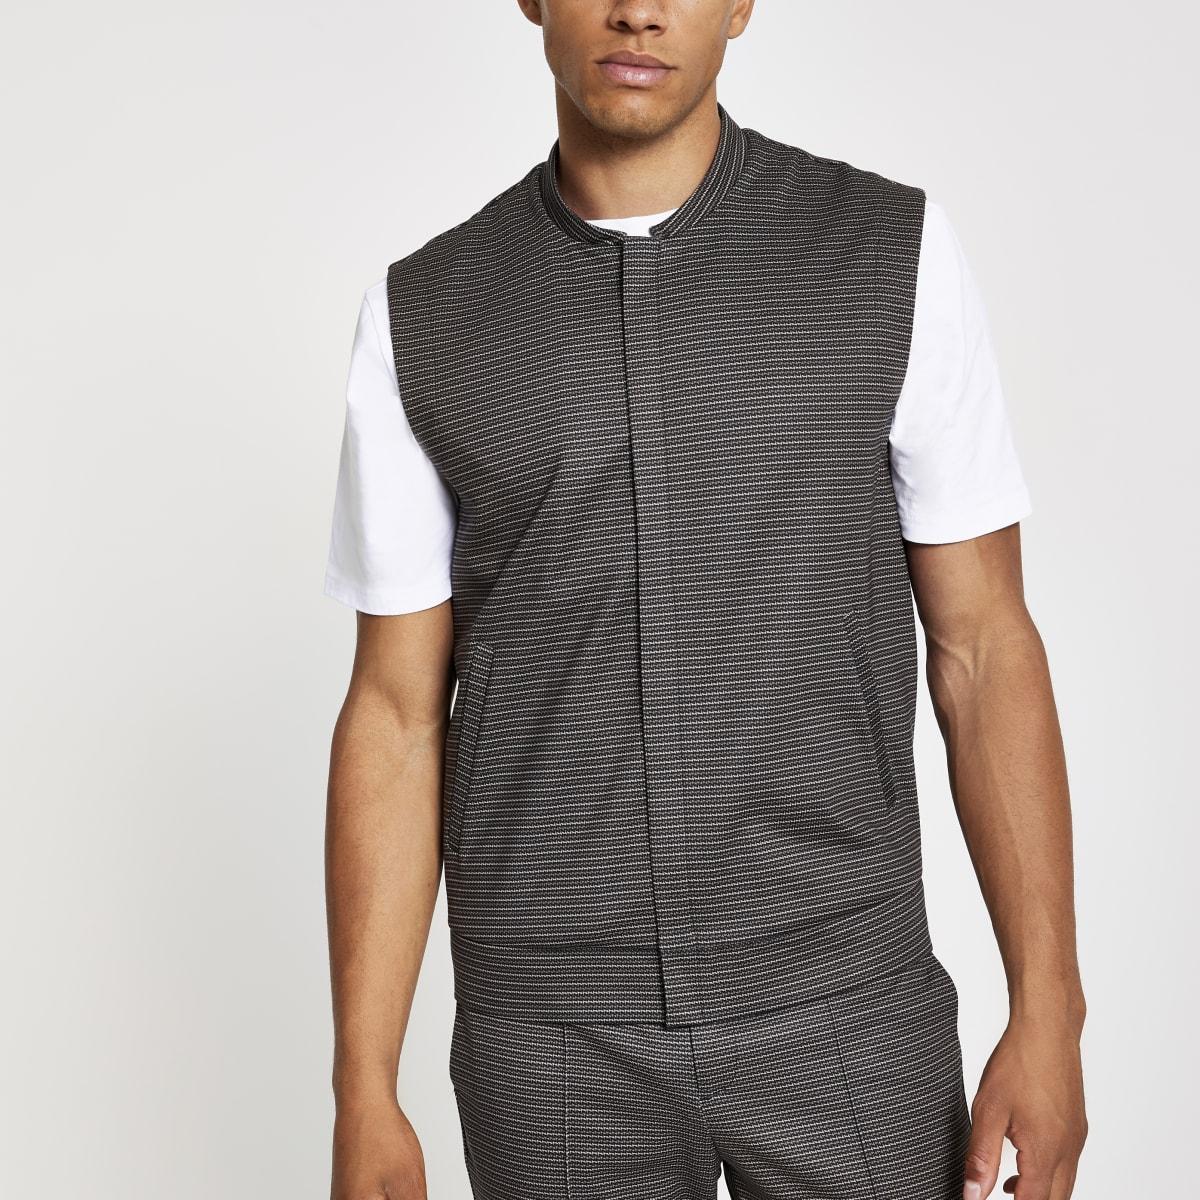 Brown skinny utility vest